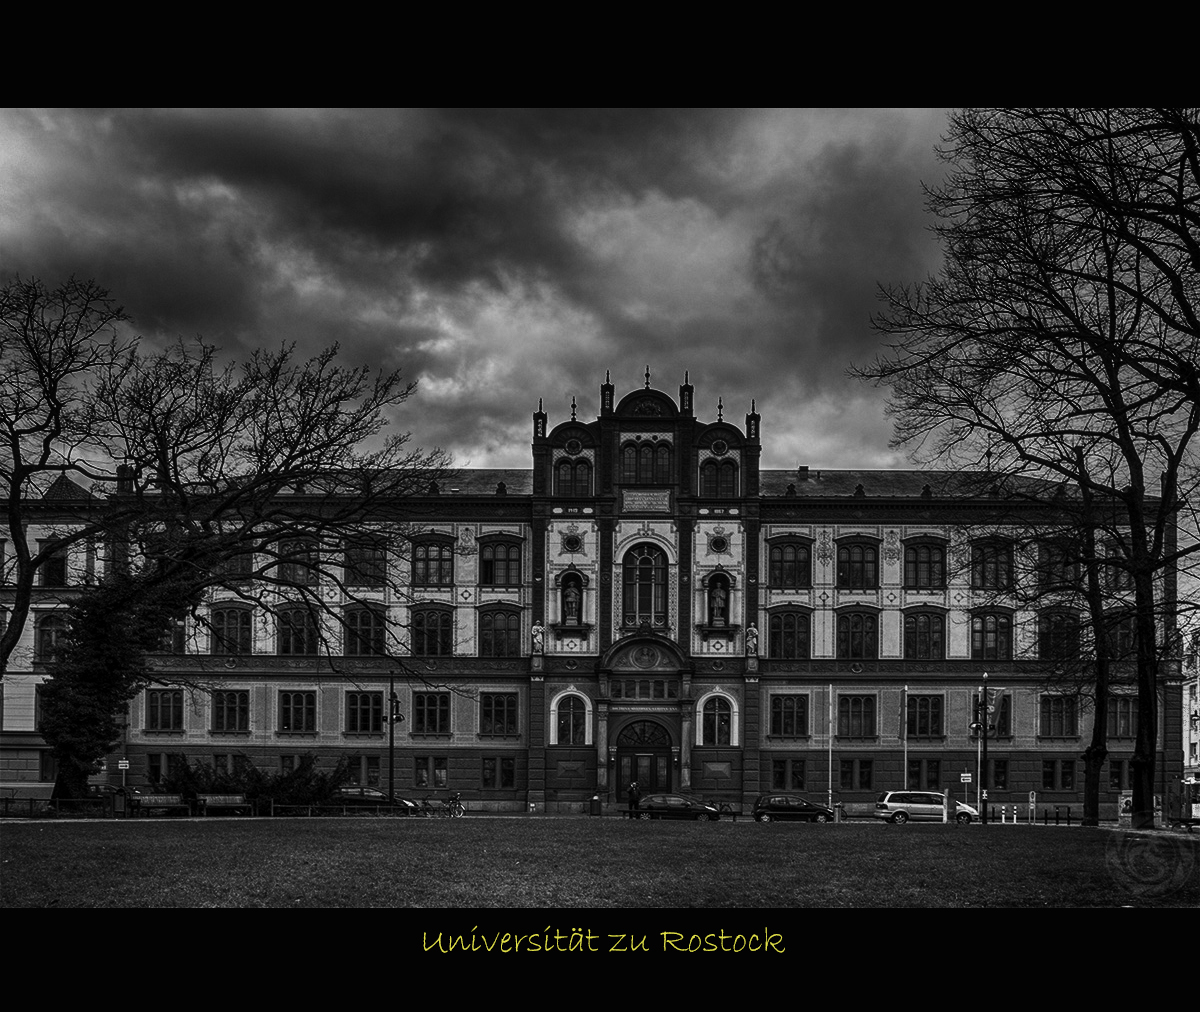 Uni_Rostock_1200_bw